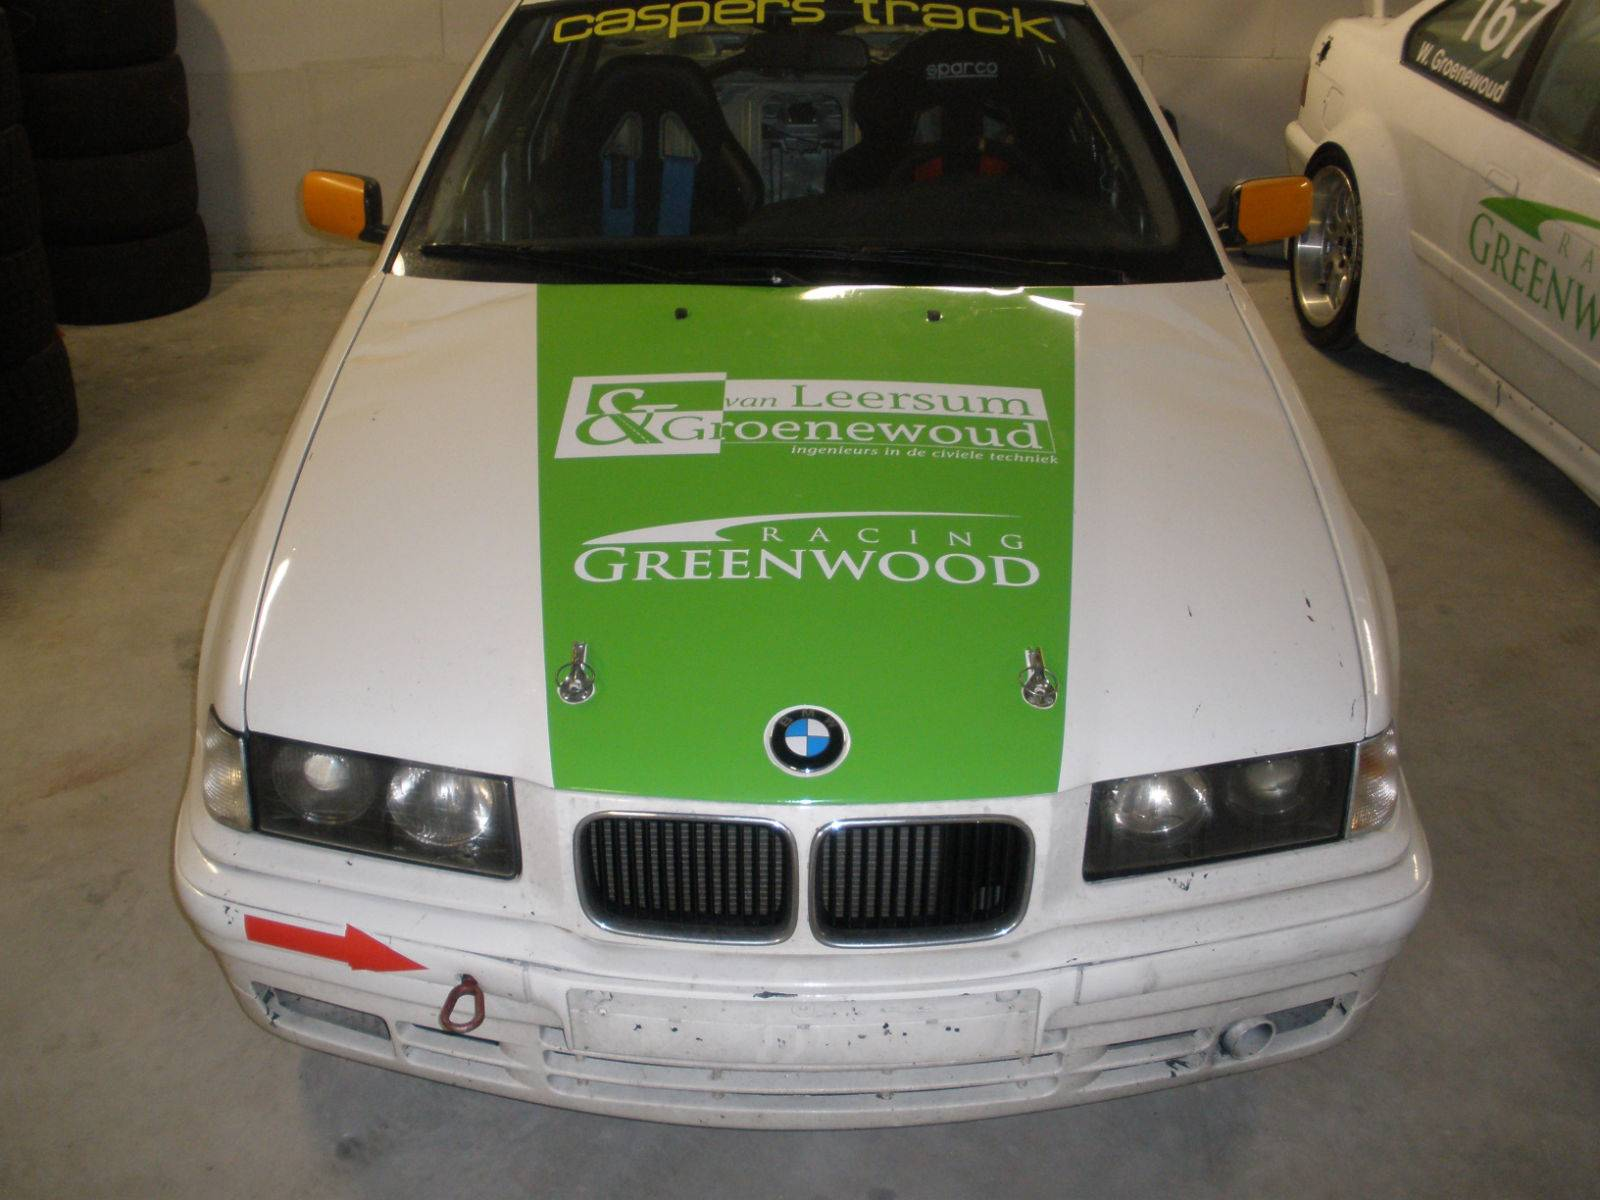 E36 greenwood-racing.nl 03